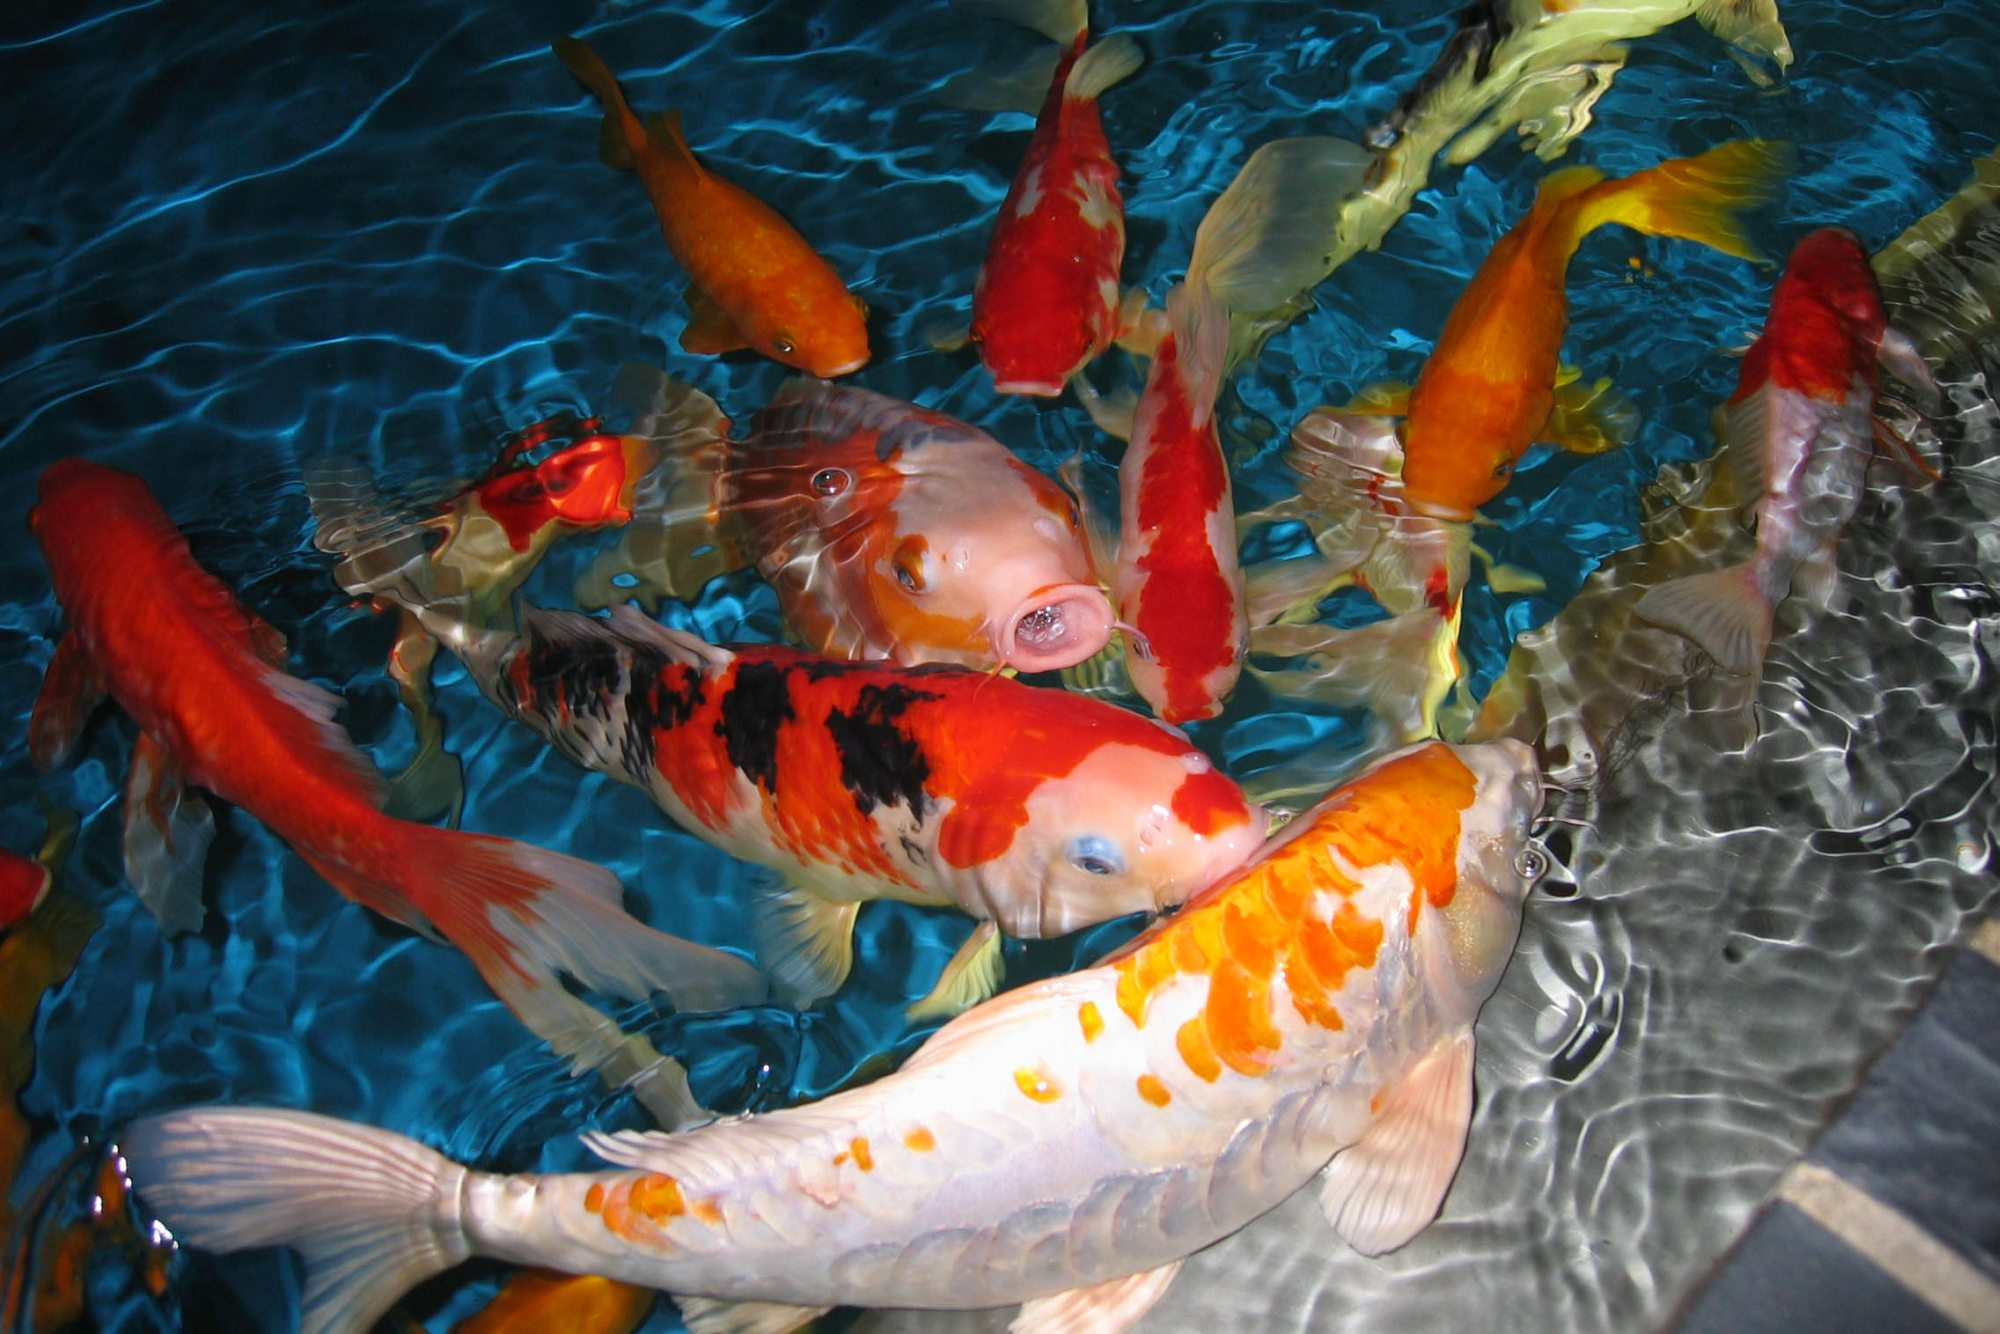 34+ HD Koi Fish Wallpaper on WallpaperSafari